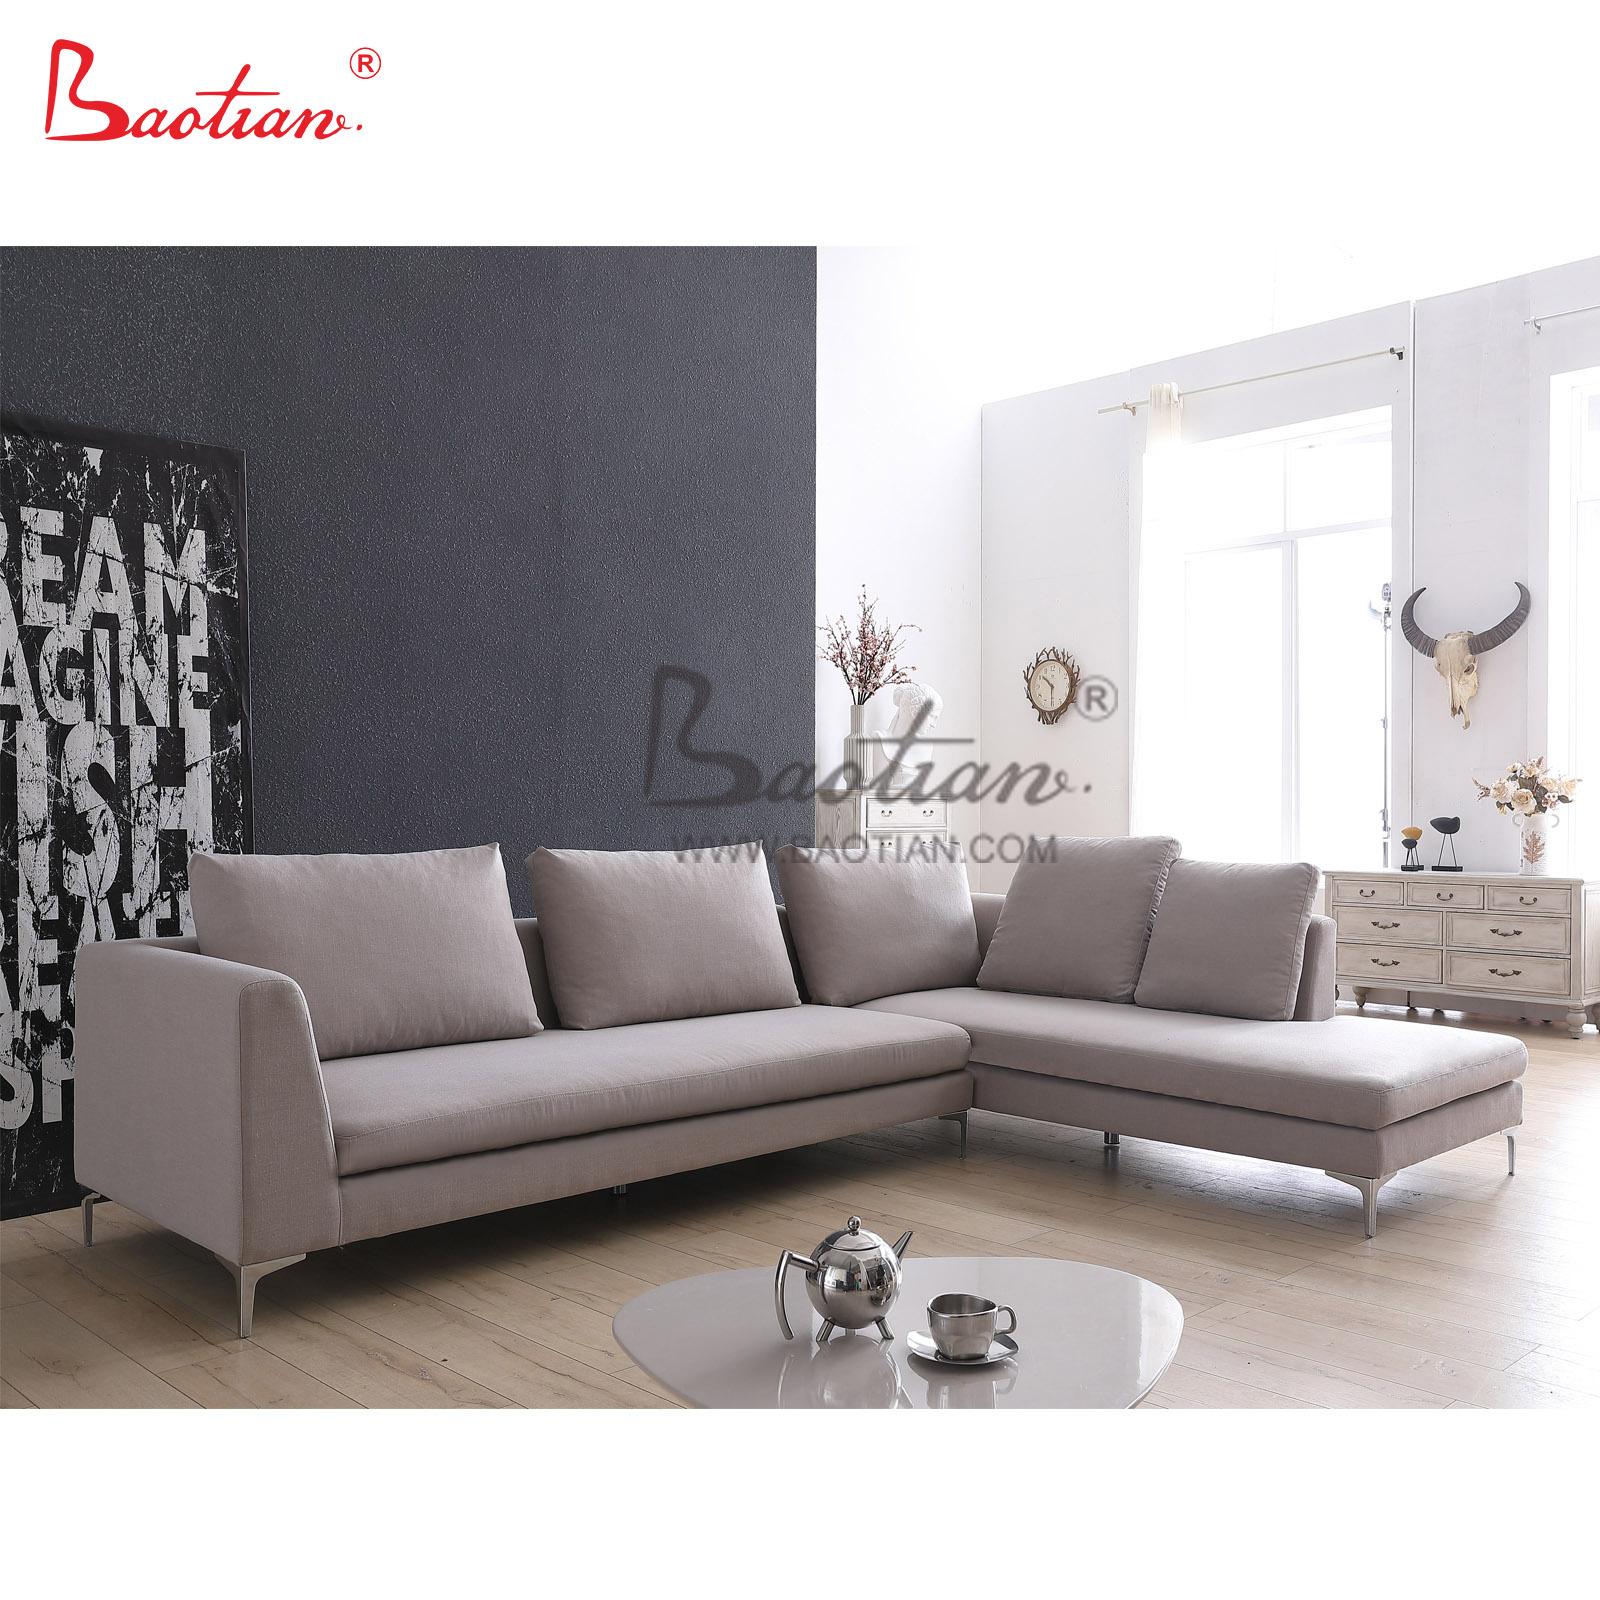 Picture of: Baotian Furniture 2020 Modern Living Room Furniture Velvet Fabric Corner Sofa Buy Modern Sofas Sectional Sofa Living Sofa Product On Alibaba Com